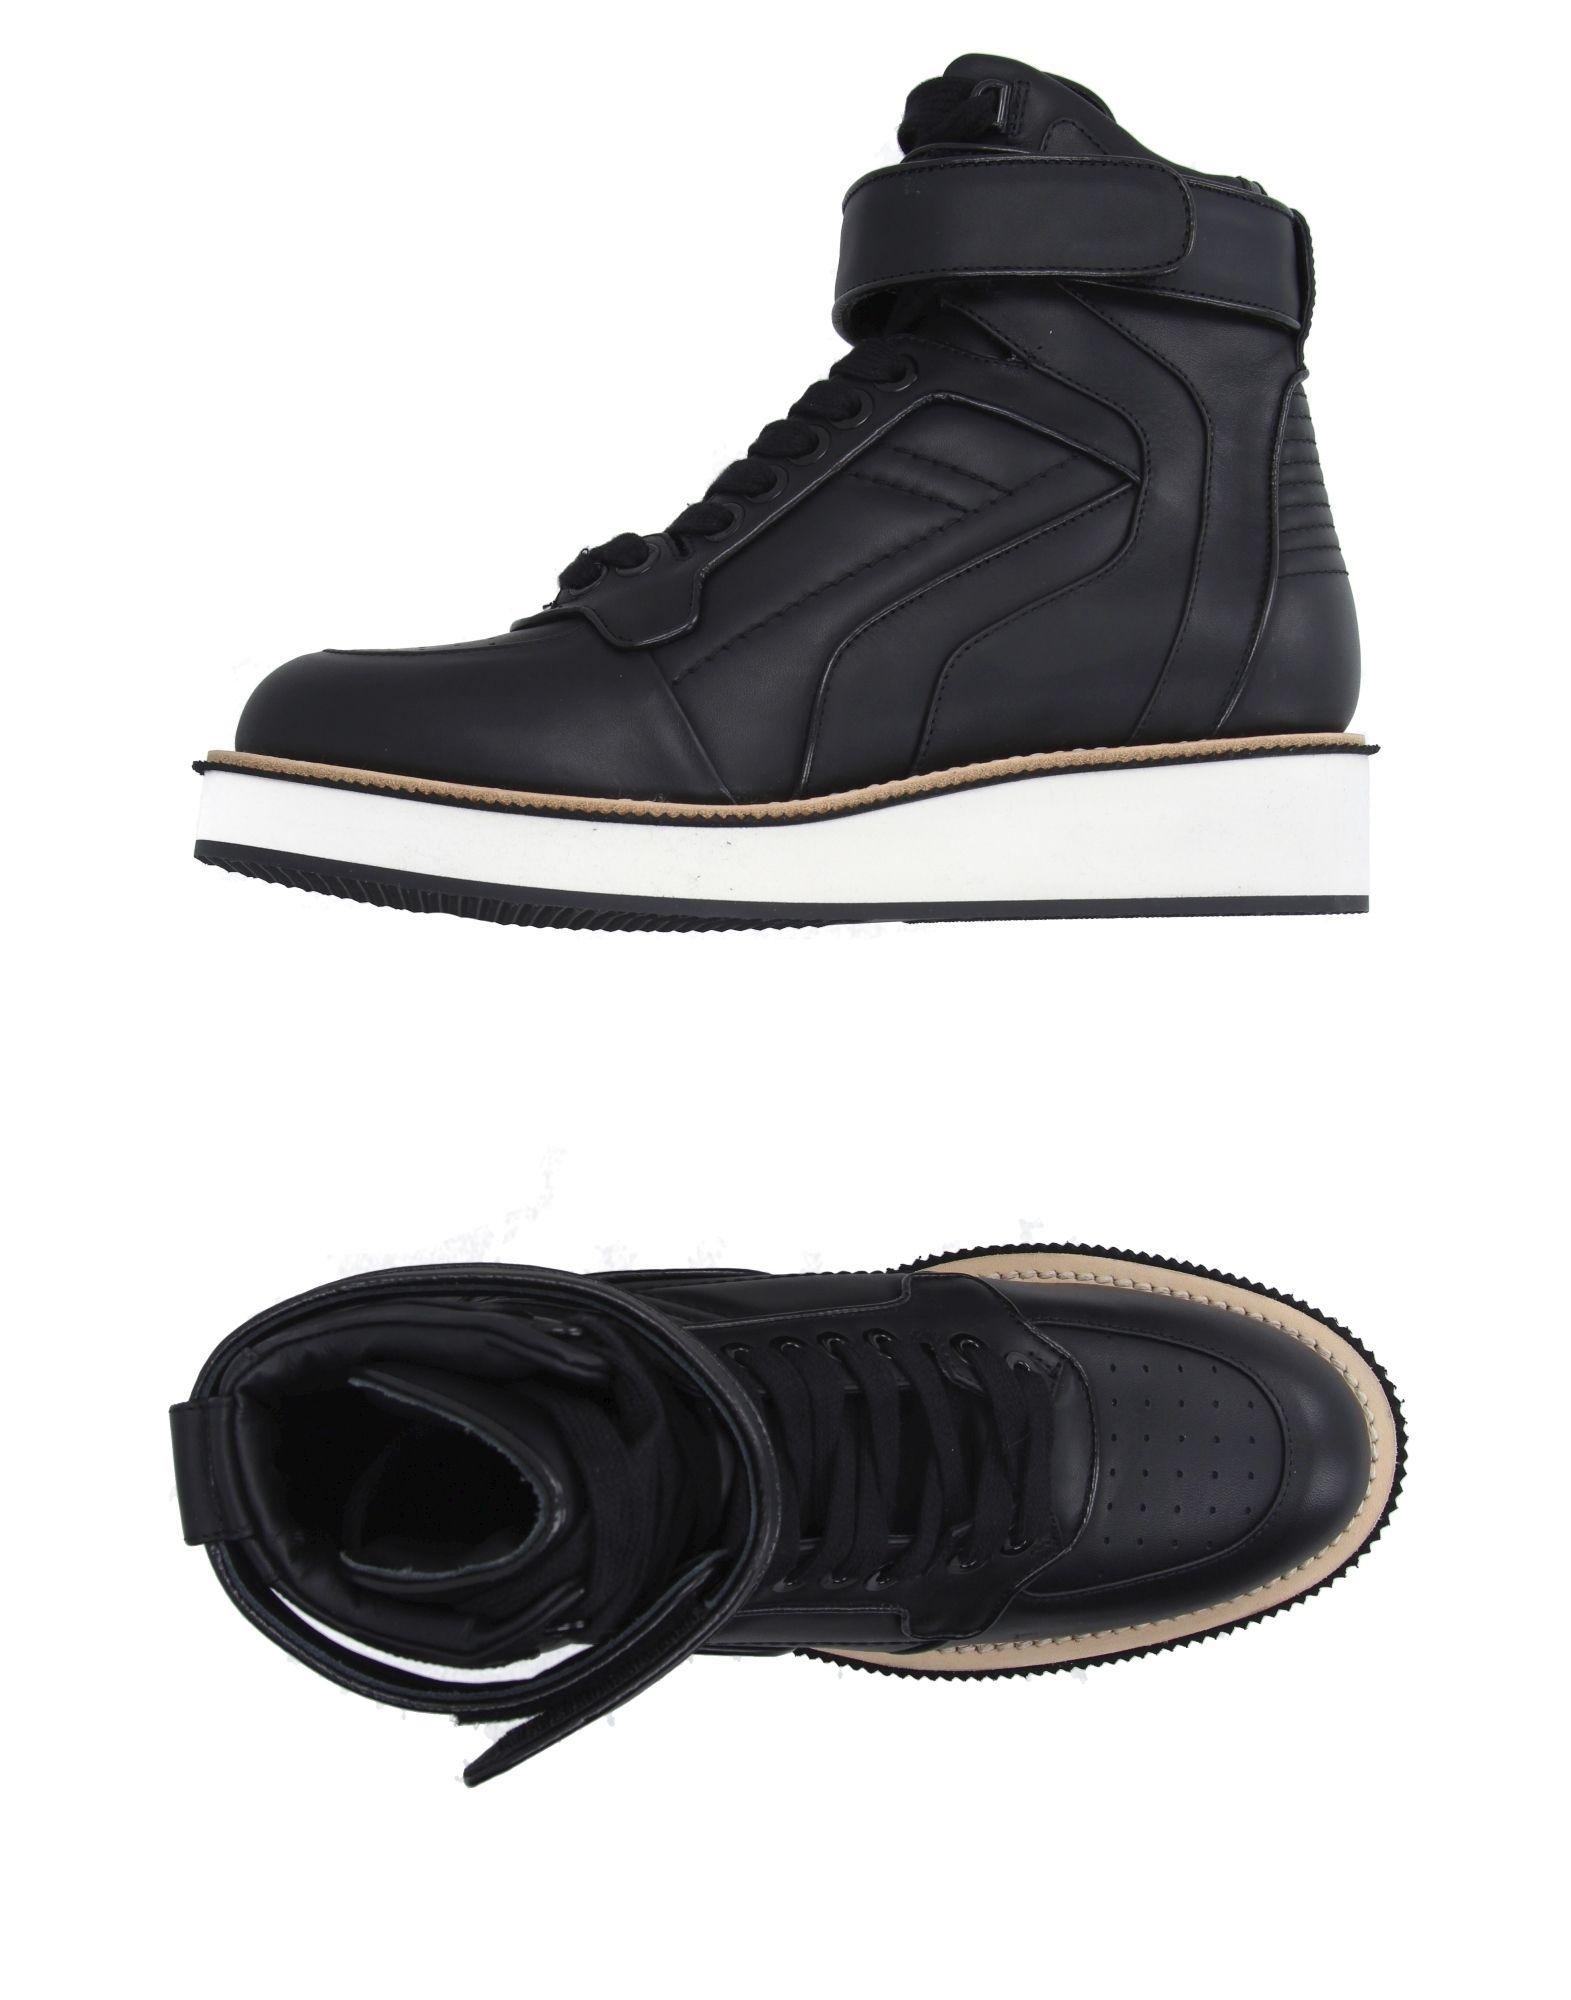 Givenchy Sneakers Herren  11011709VP Gute Qualität beliebte Schuhe